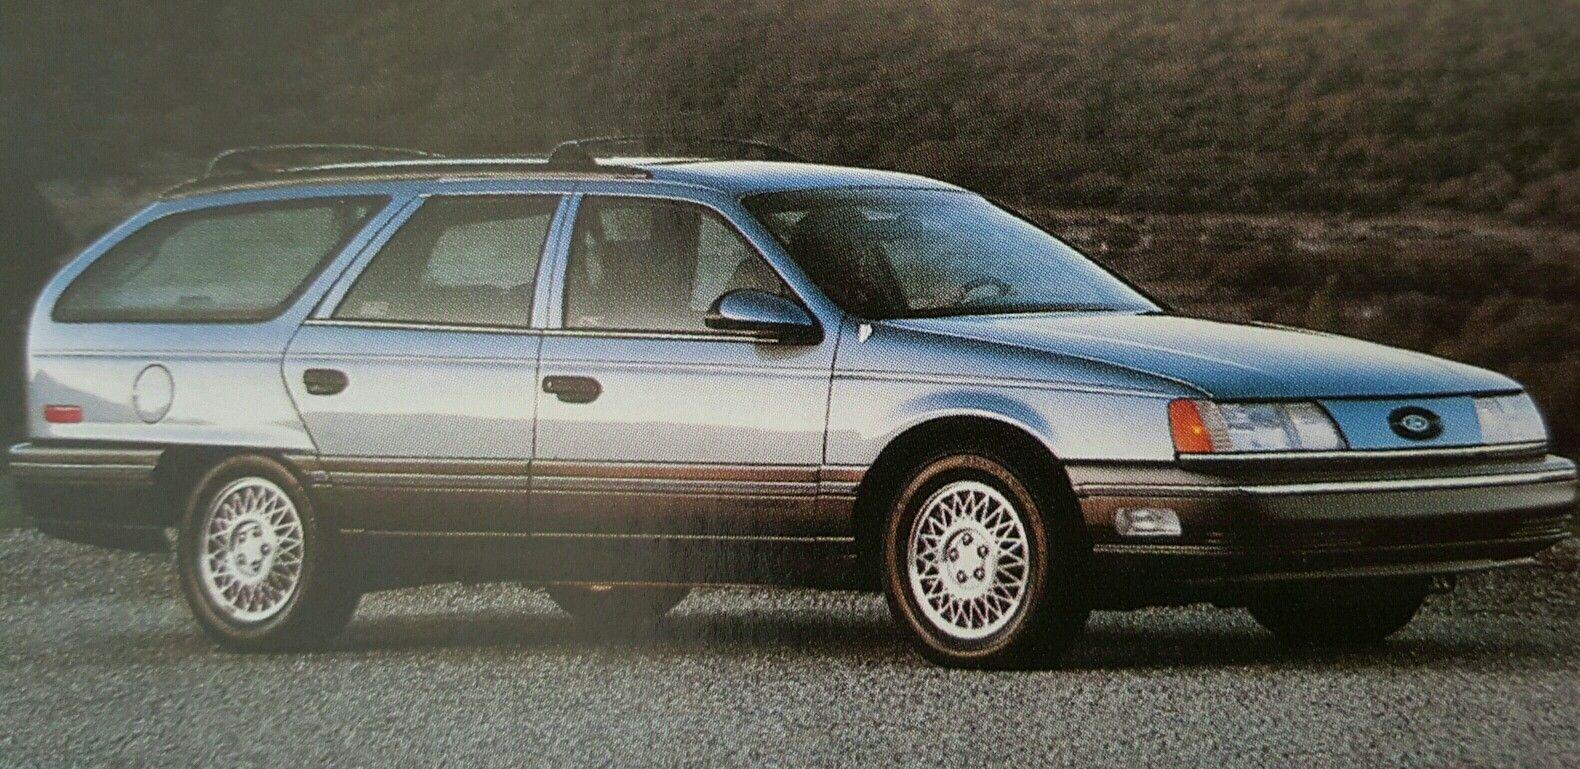 1989 Ford Taurus Lx Station Wagon Station Wagon Wagon Cross Country Road Trip